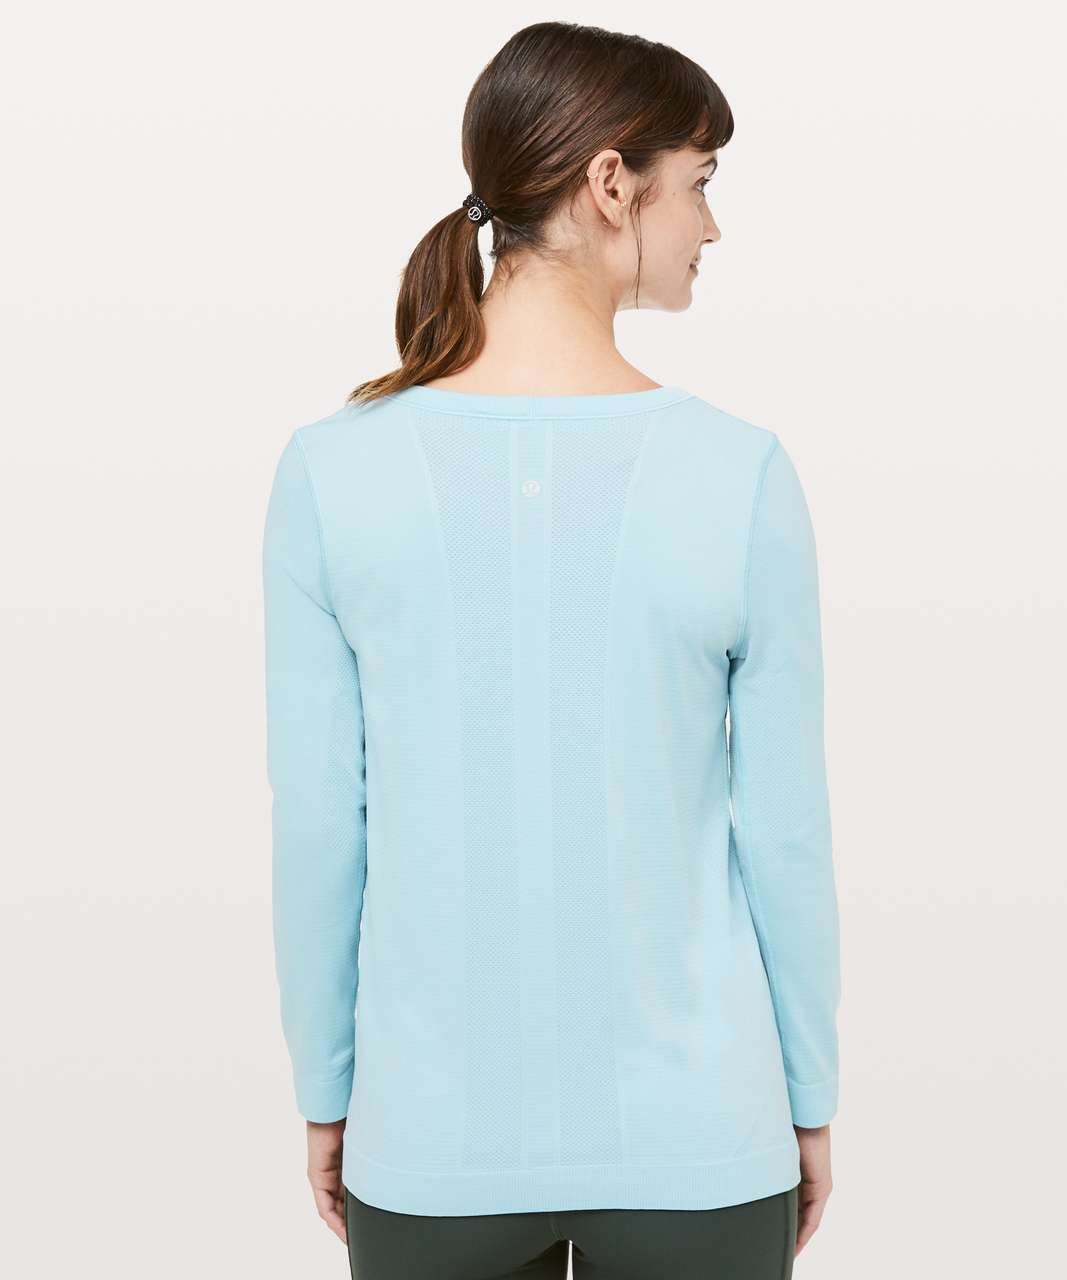 Lululemon Swiftly Tech Long Sleeve (Breeze) *Relaxed Fit - Blue Haze / Blue Haze